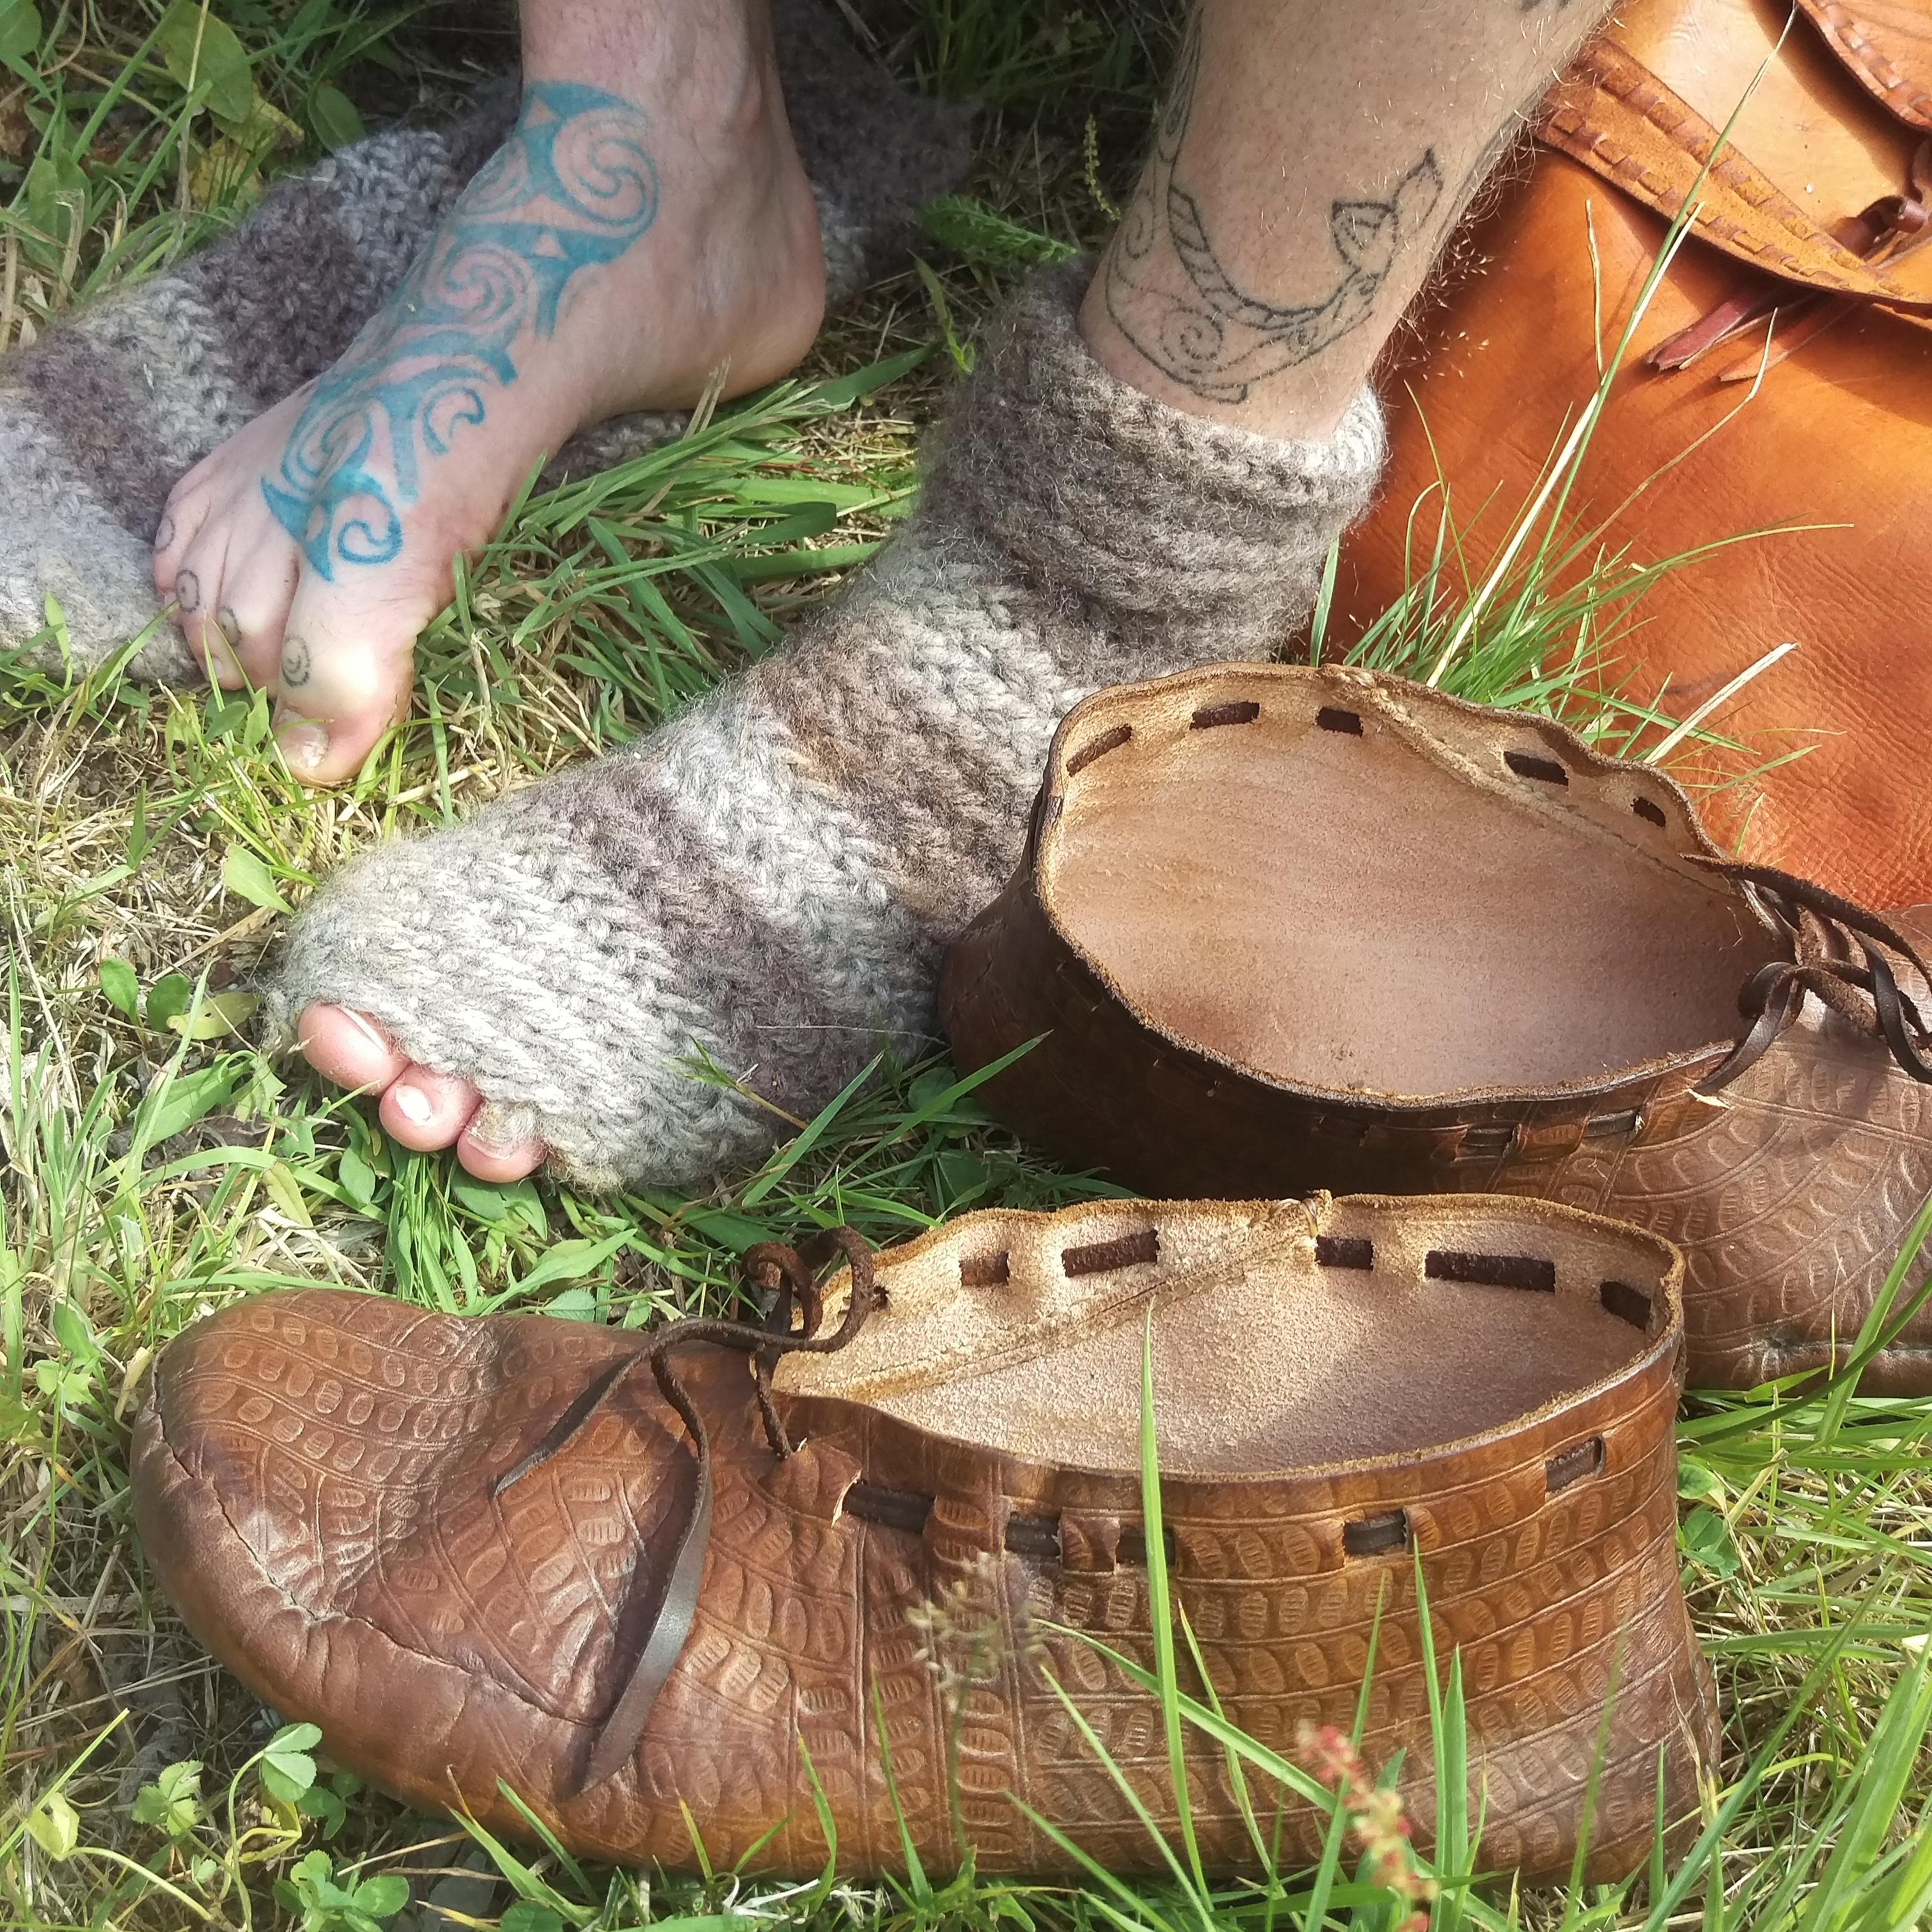 Dundurn shoe